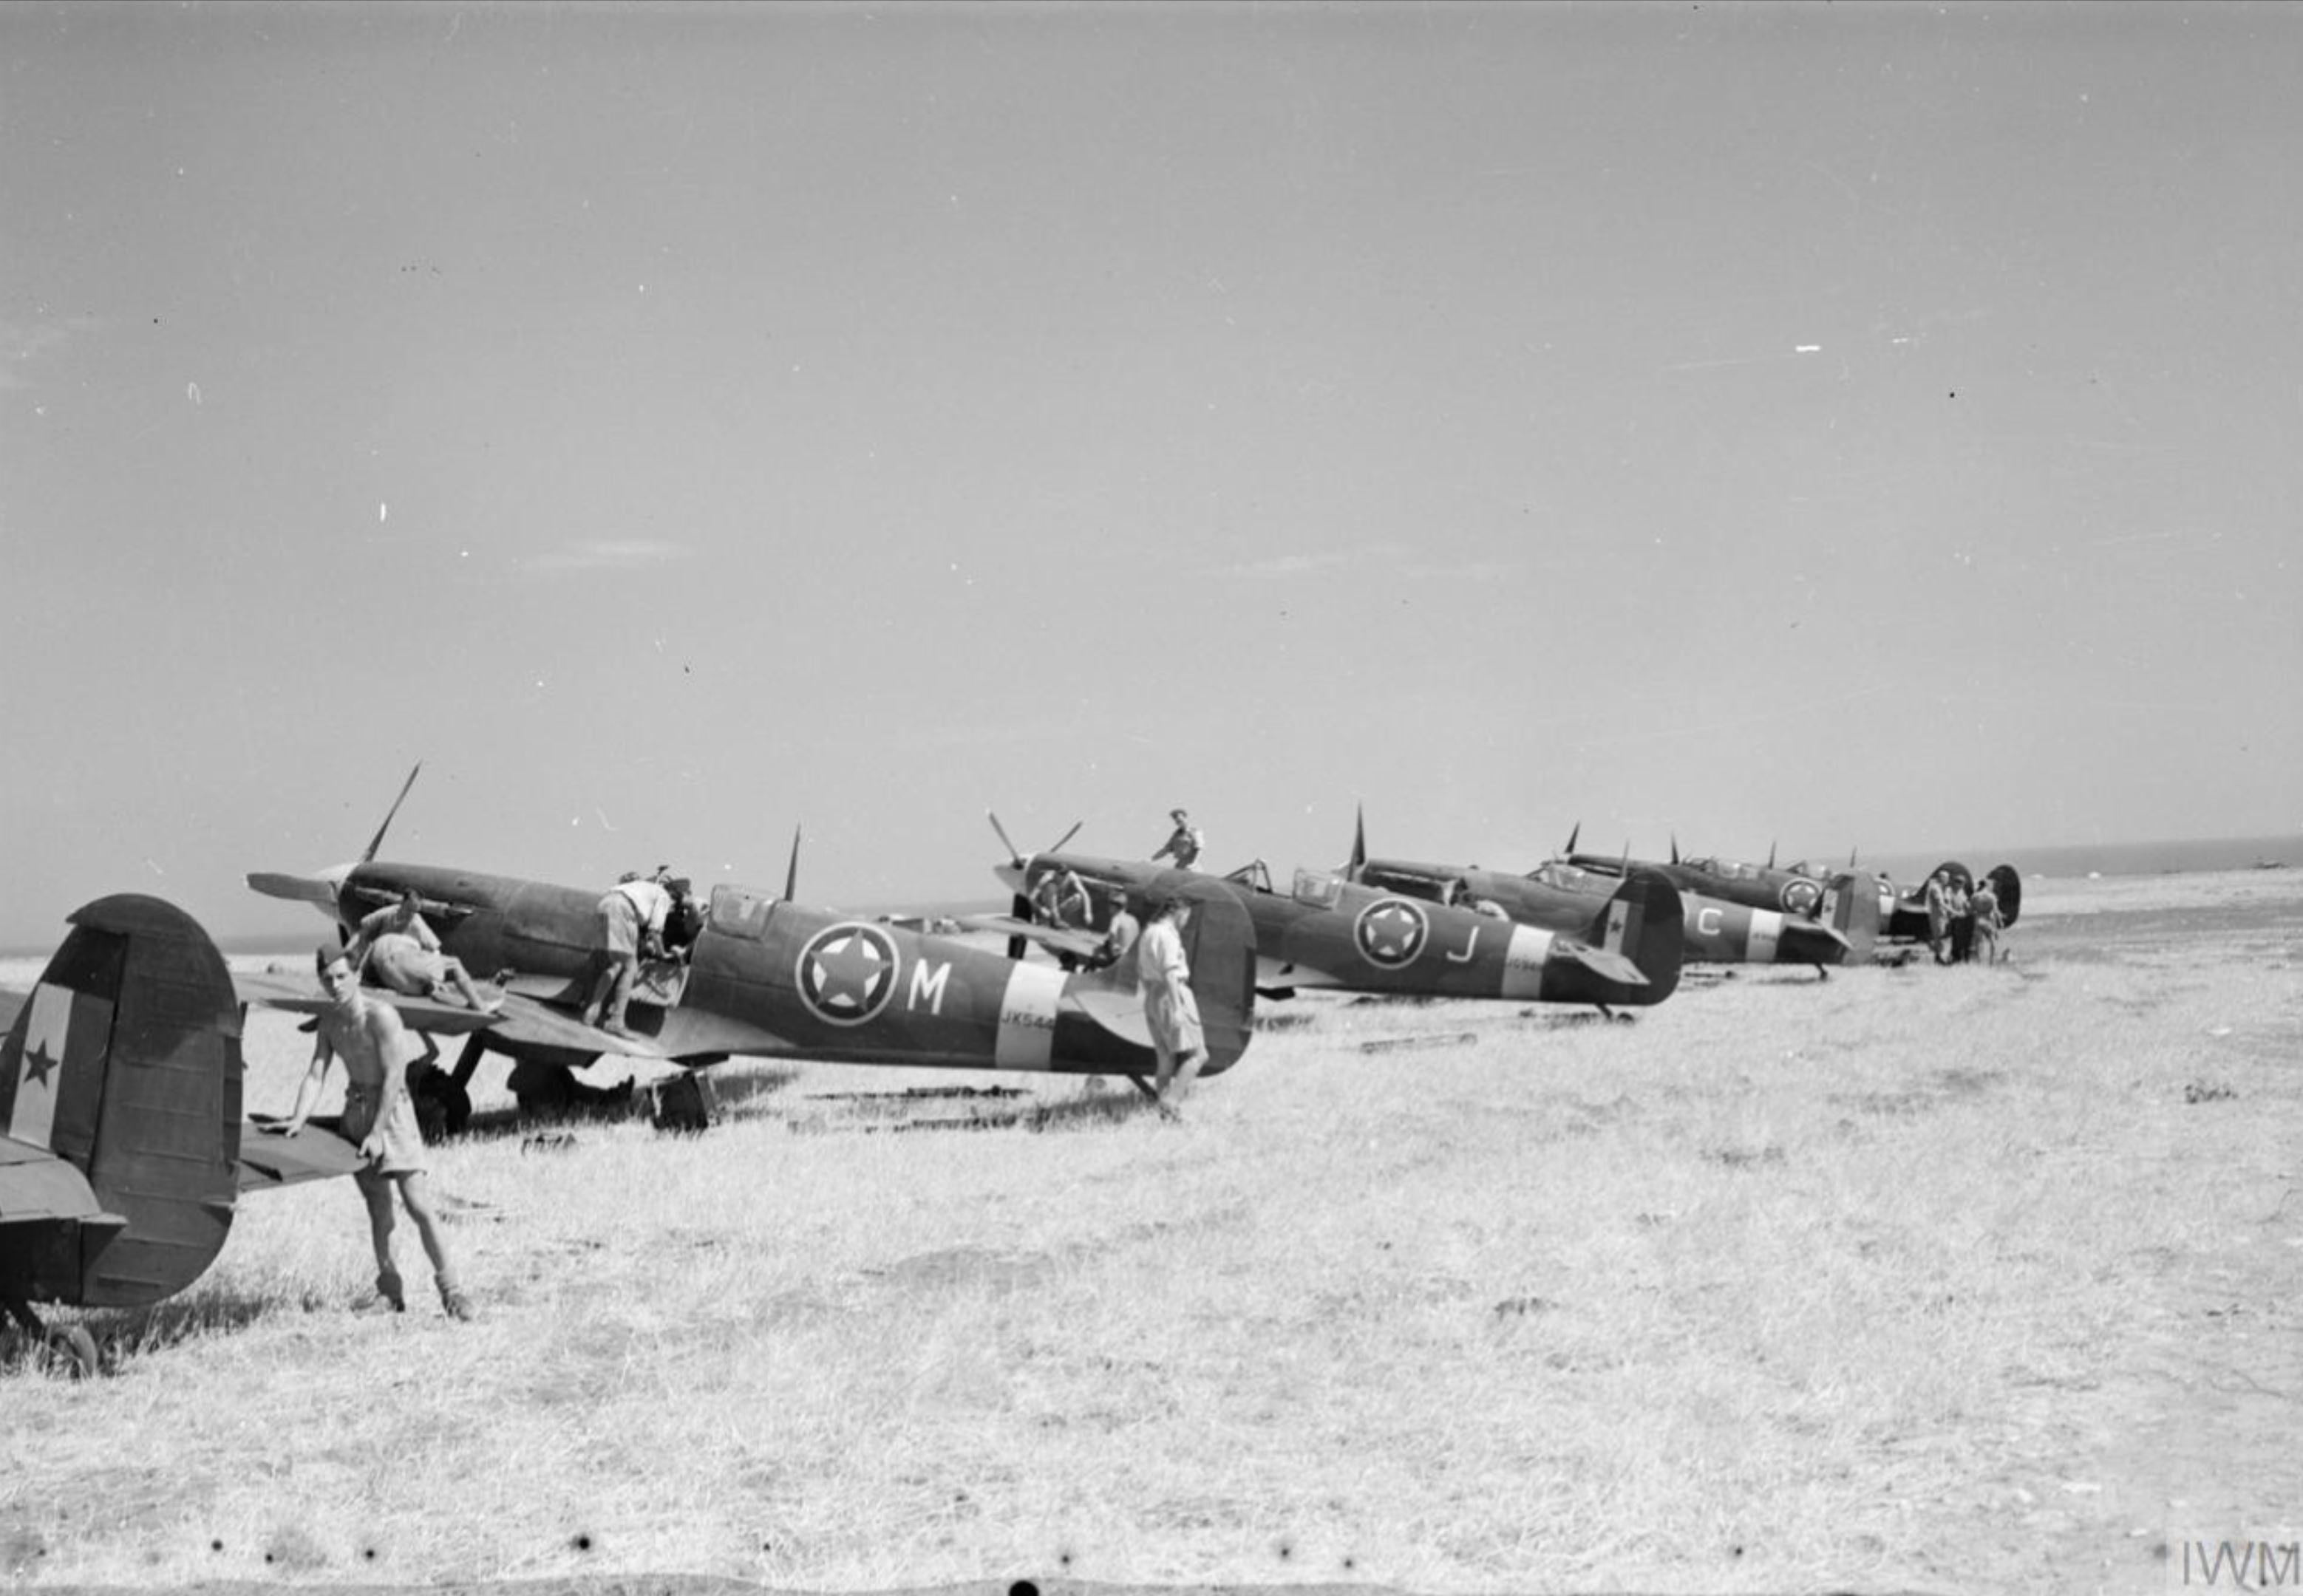 Spitfire MkVcTrop RAF 352Sqn M JK544 at Canne Italy 1944 IWM CNA3097